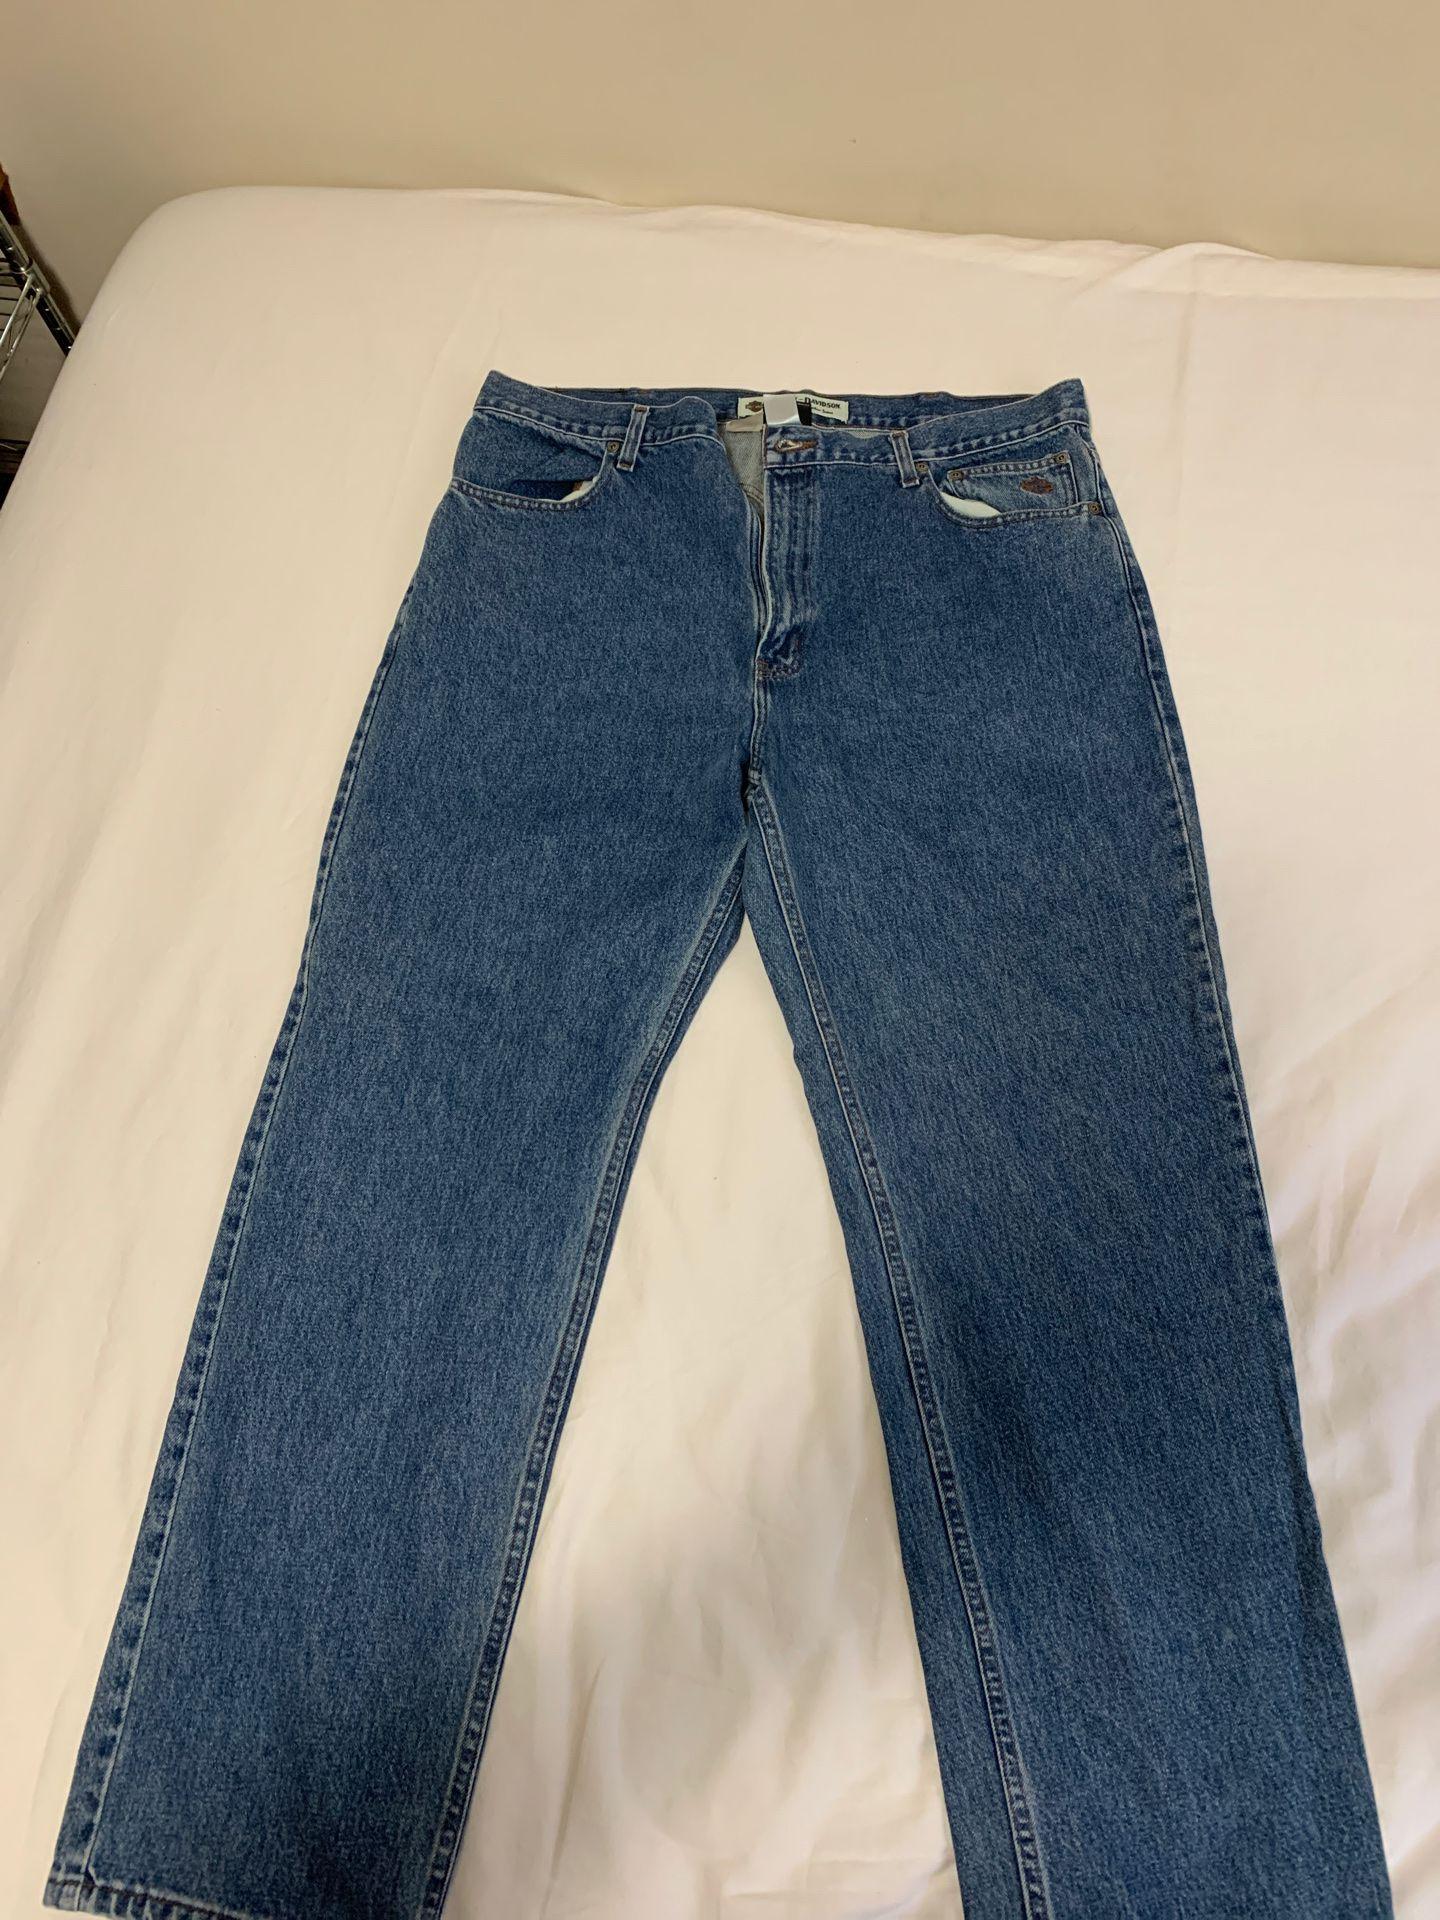 Harley-Davidson men's jeans size 40x32